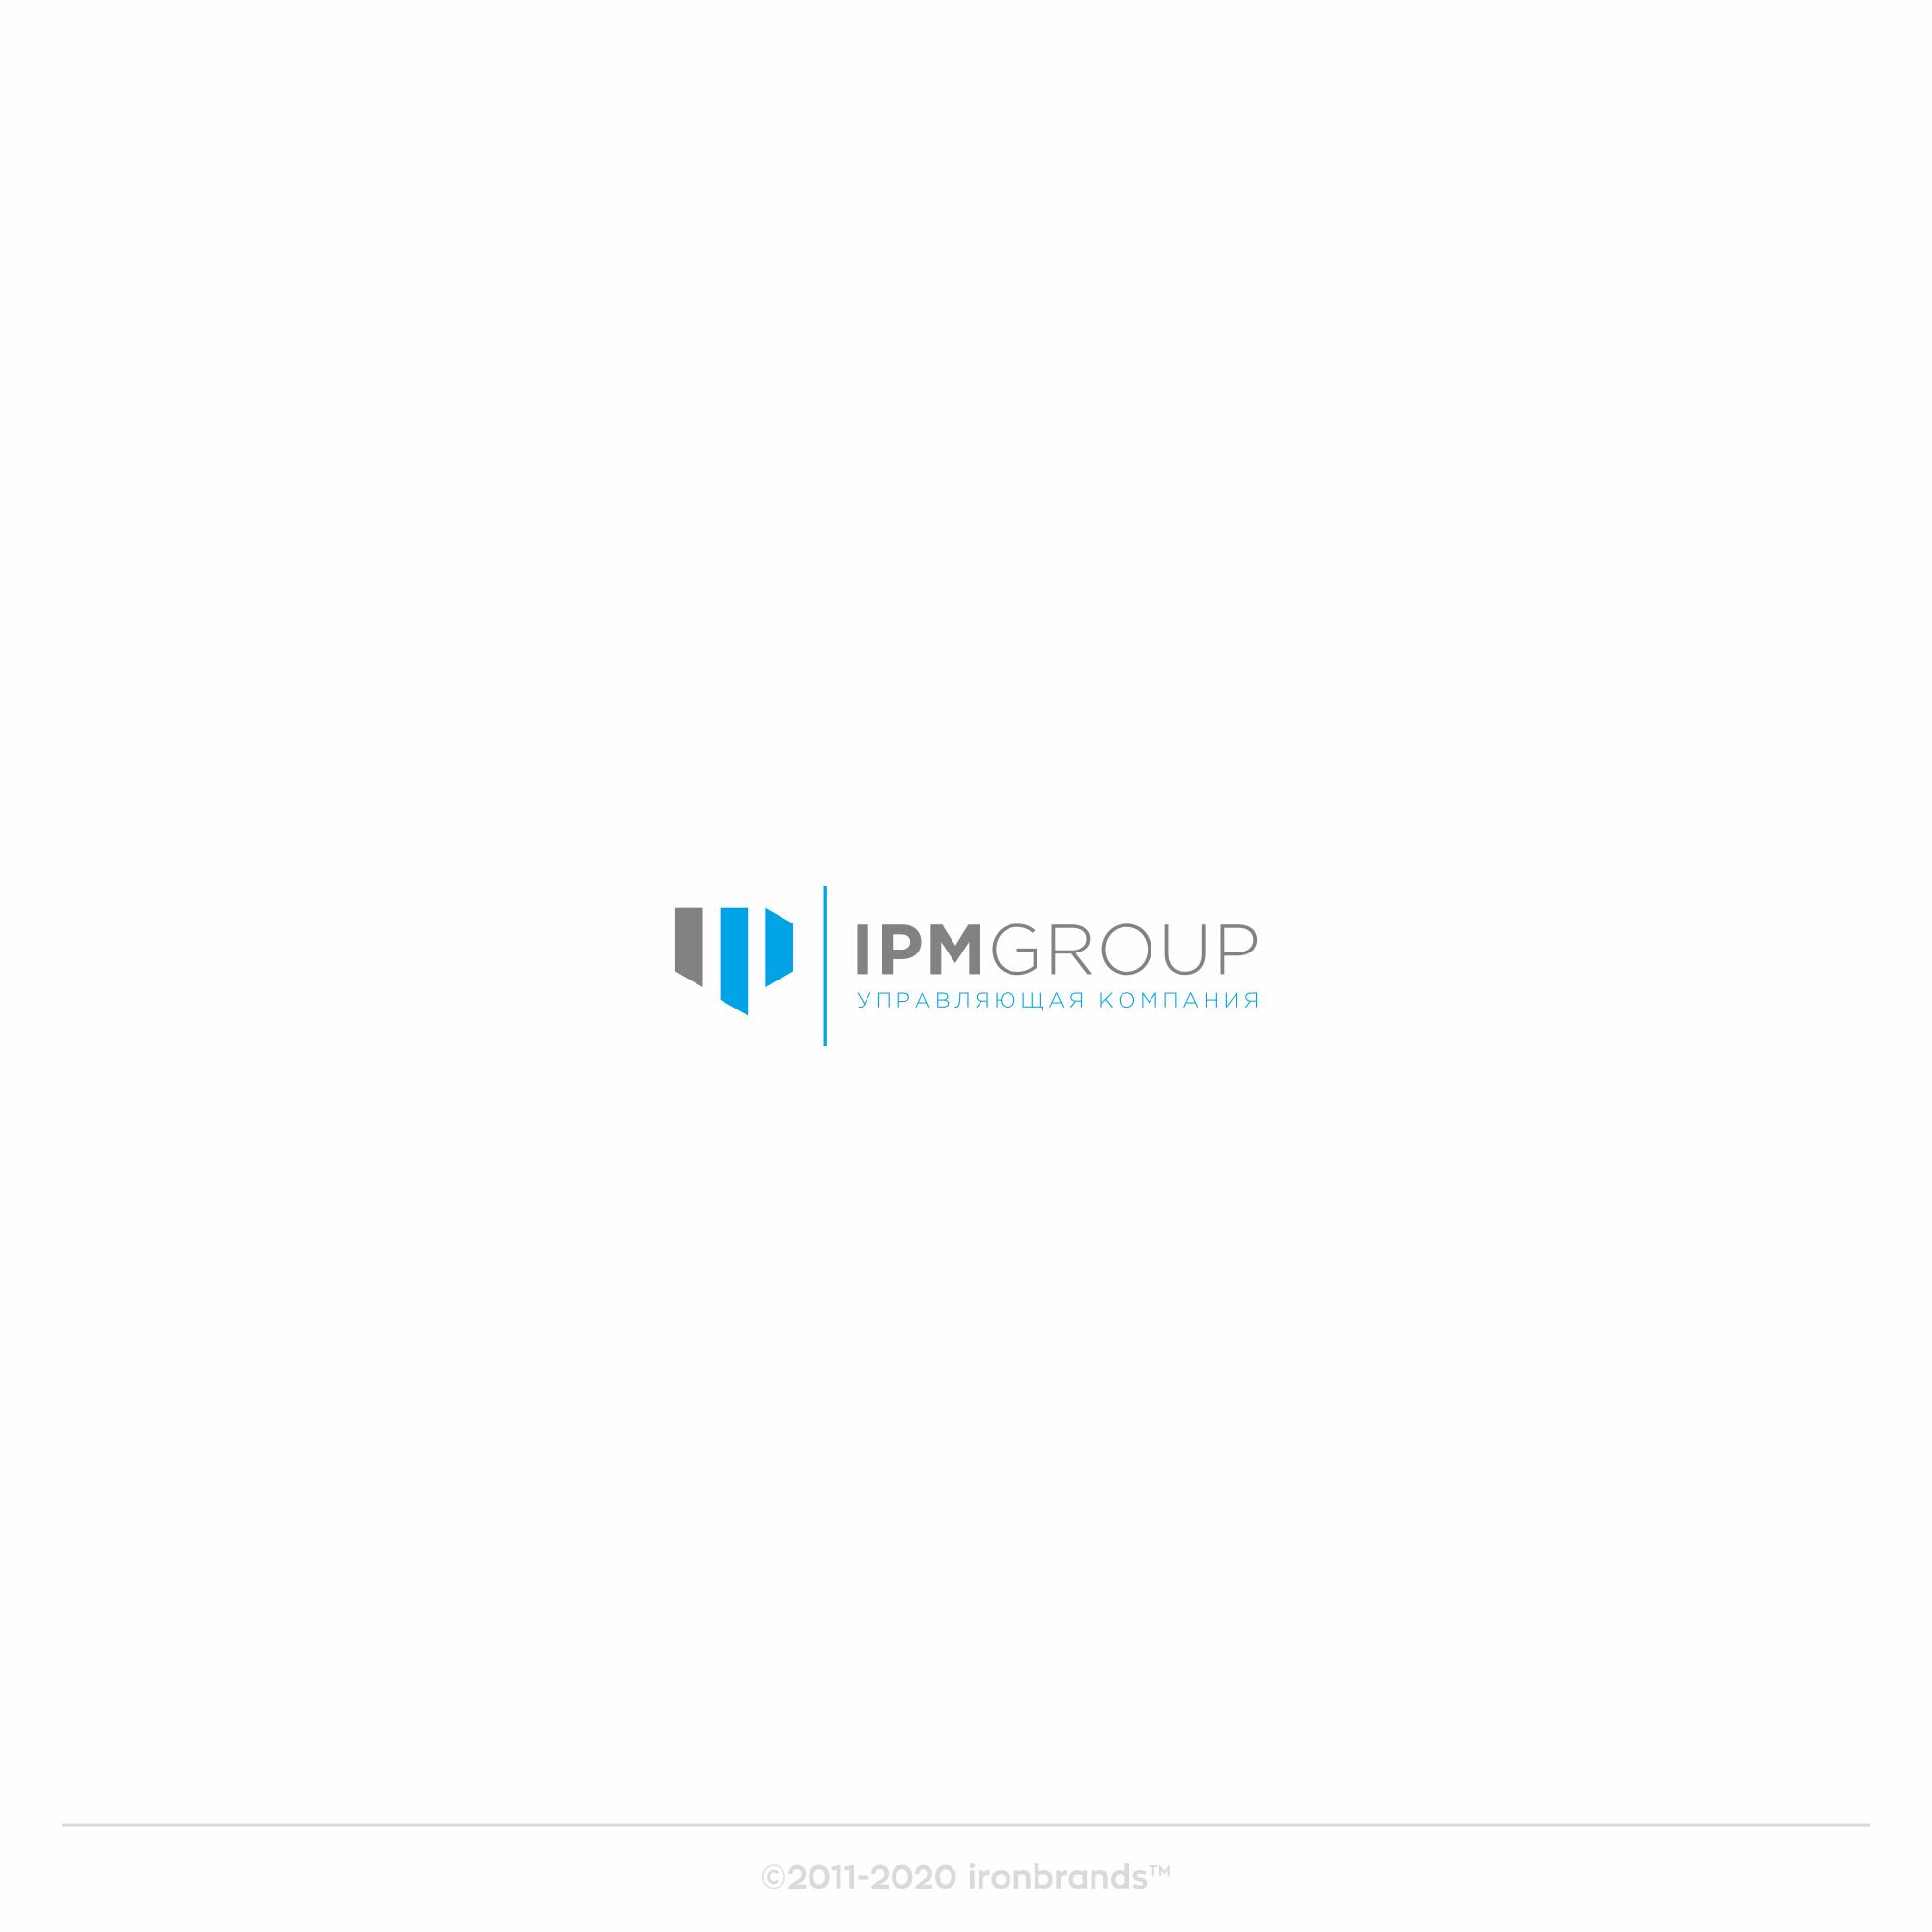 Разработка логотипа для управляющей компании фото f_4825f834b51c334d.jpg